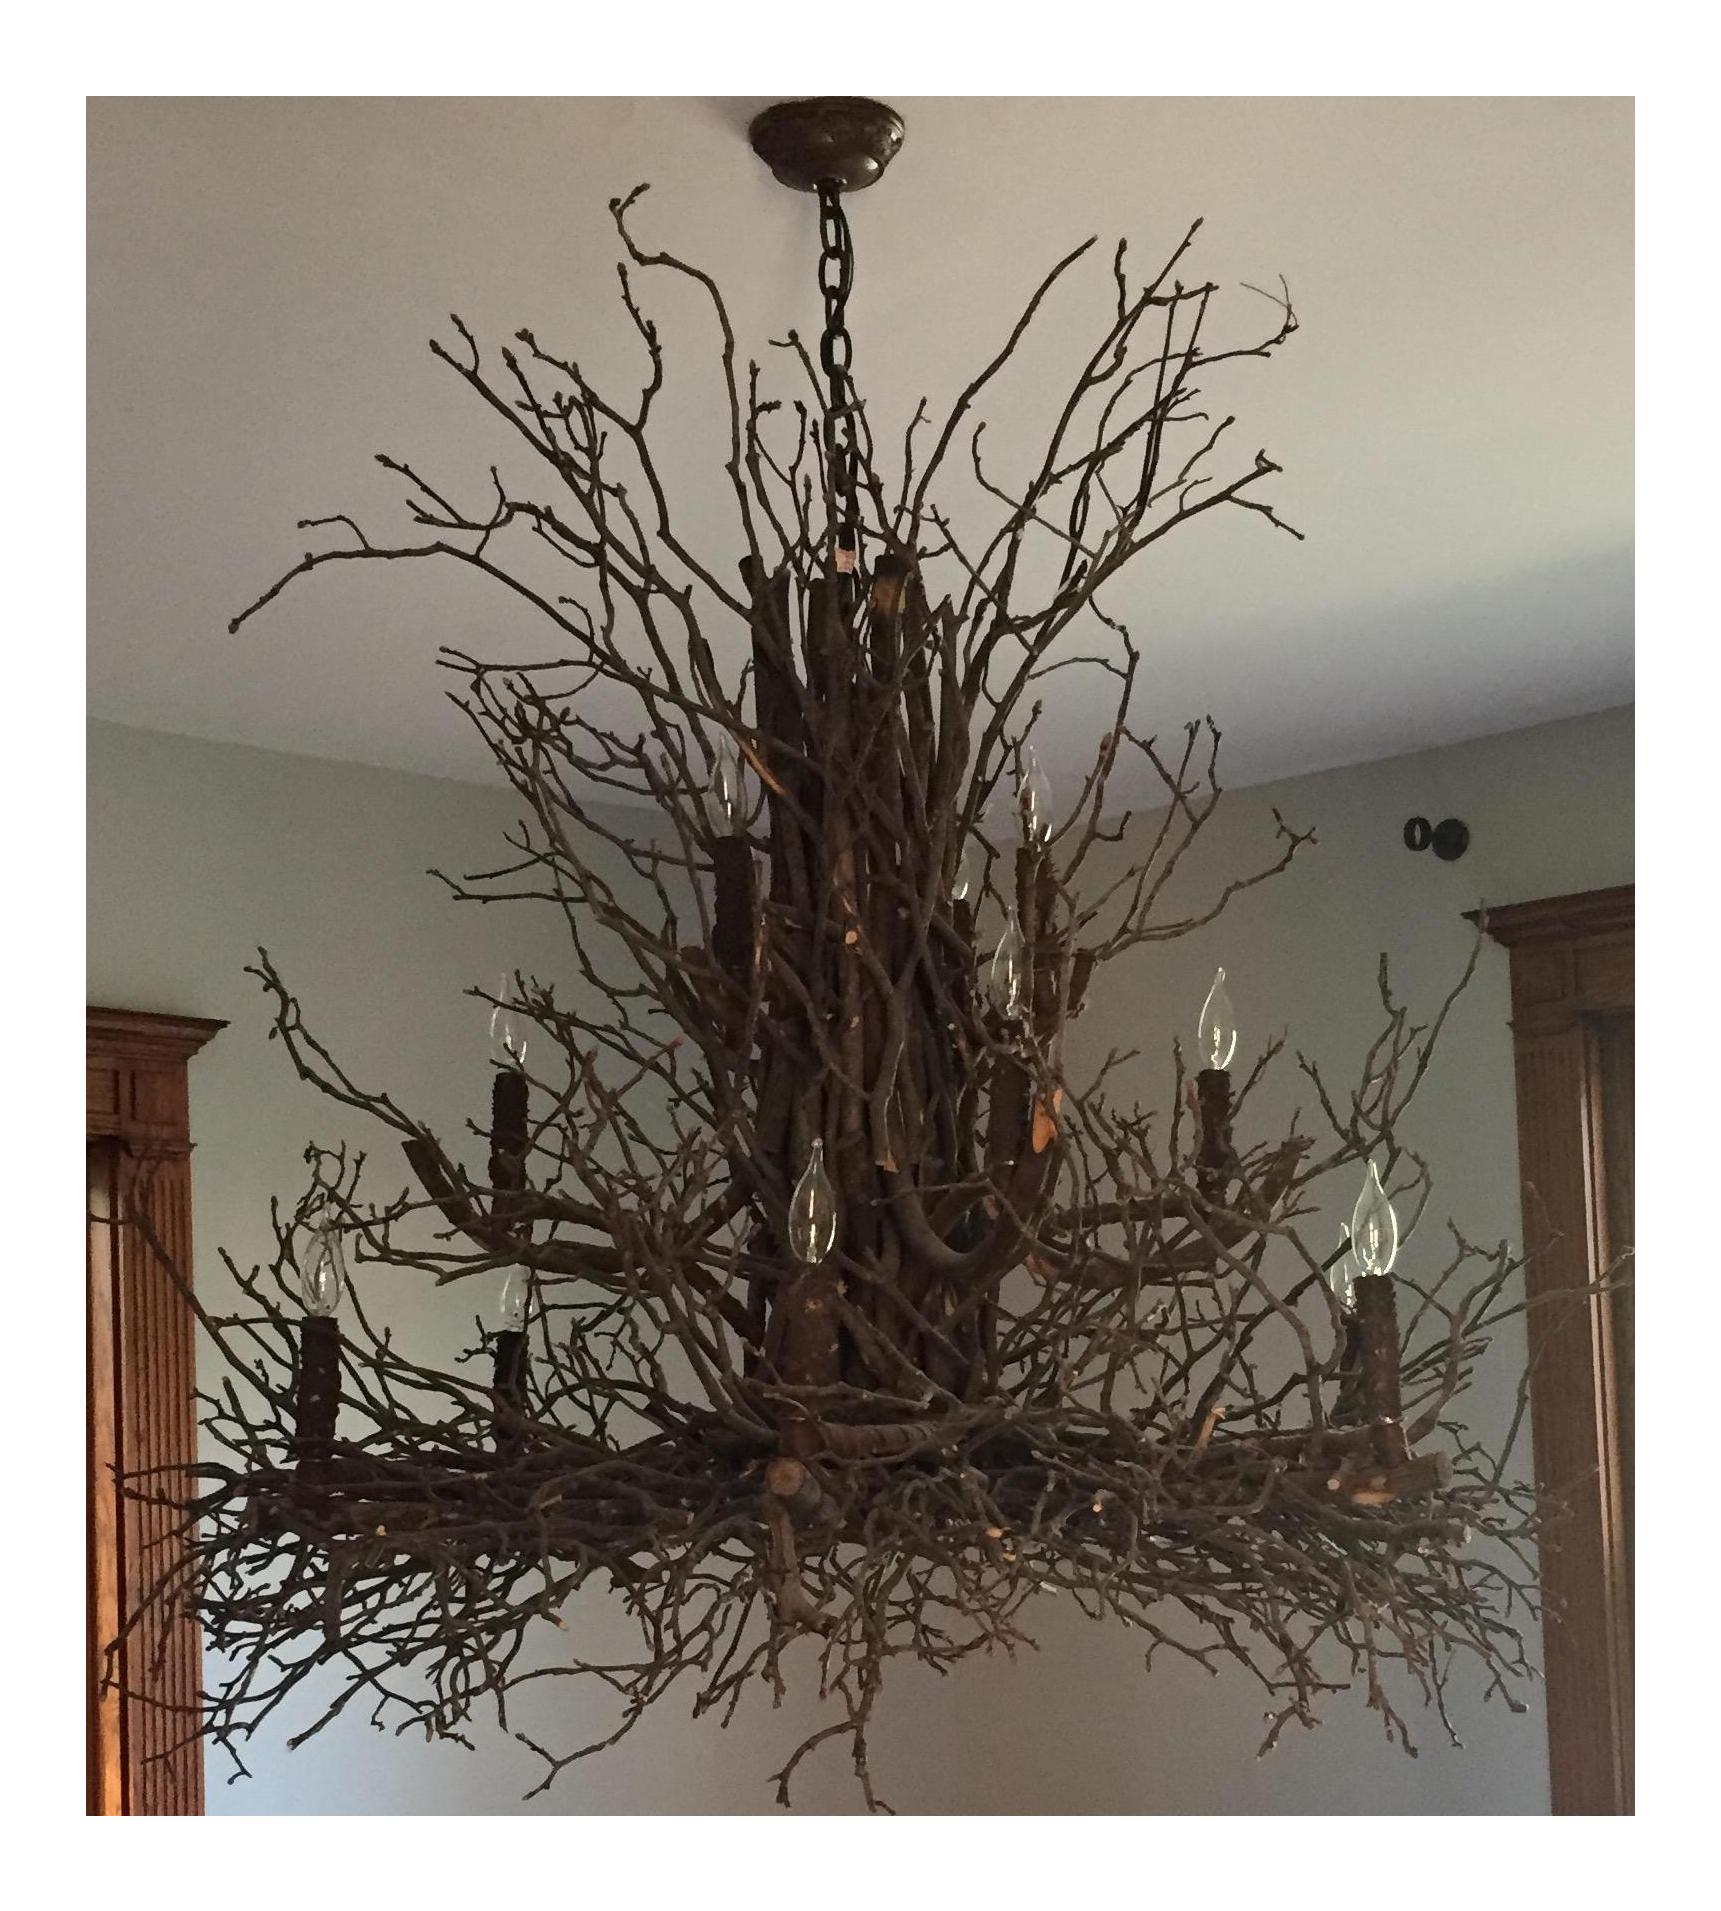 Willow Branch Chandelier